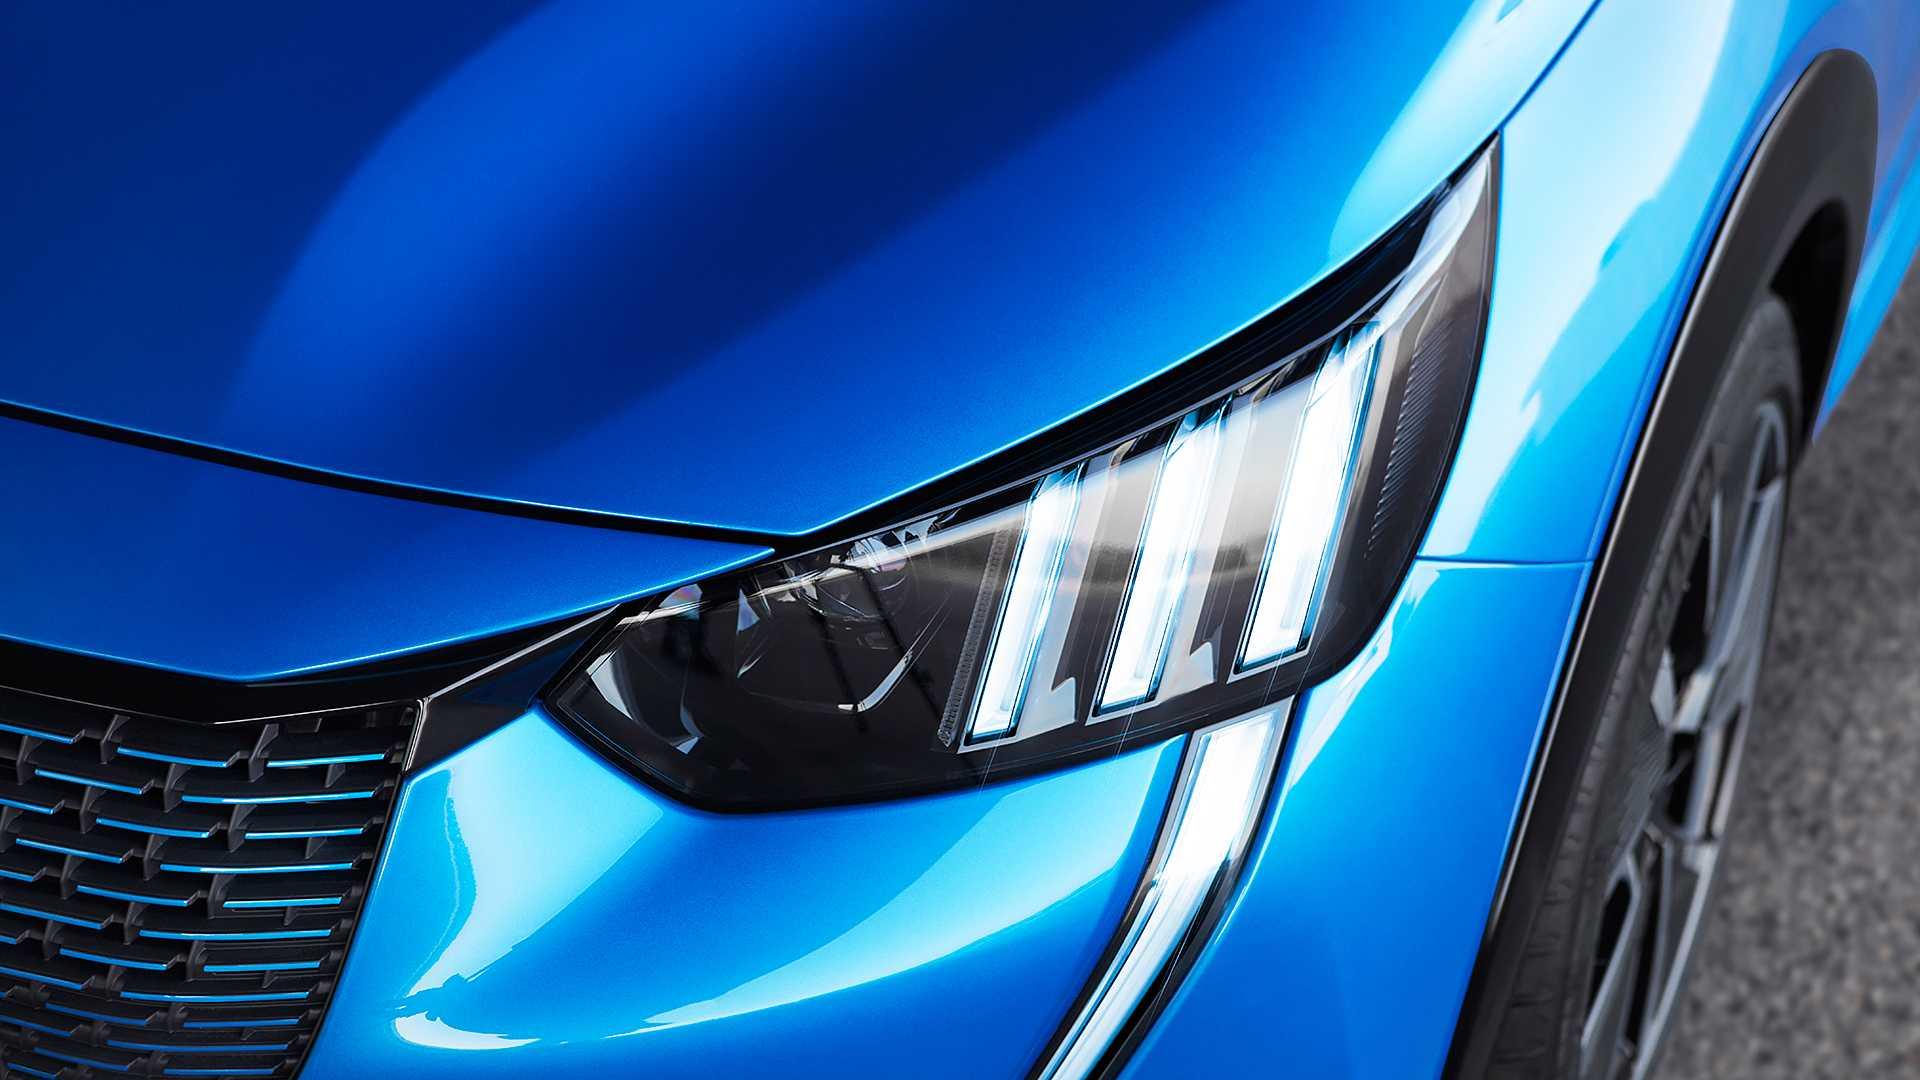 2020 Peugeot e-208 EV Headlight Wallpaper (14)